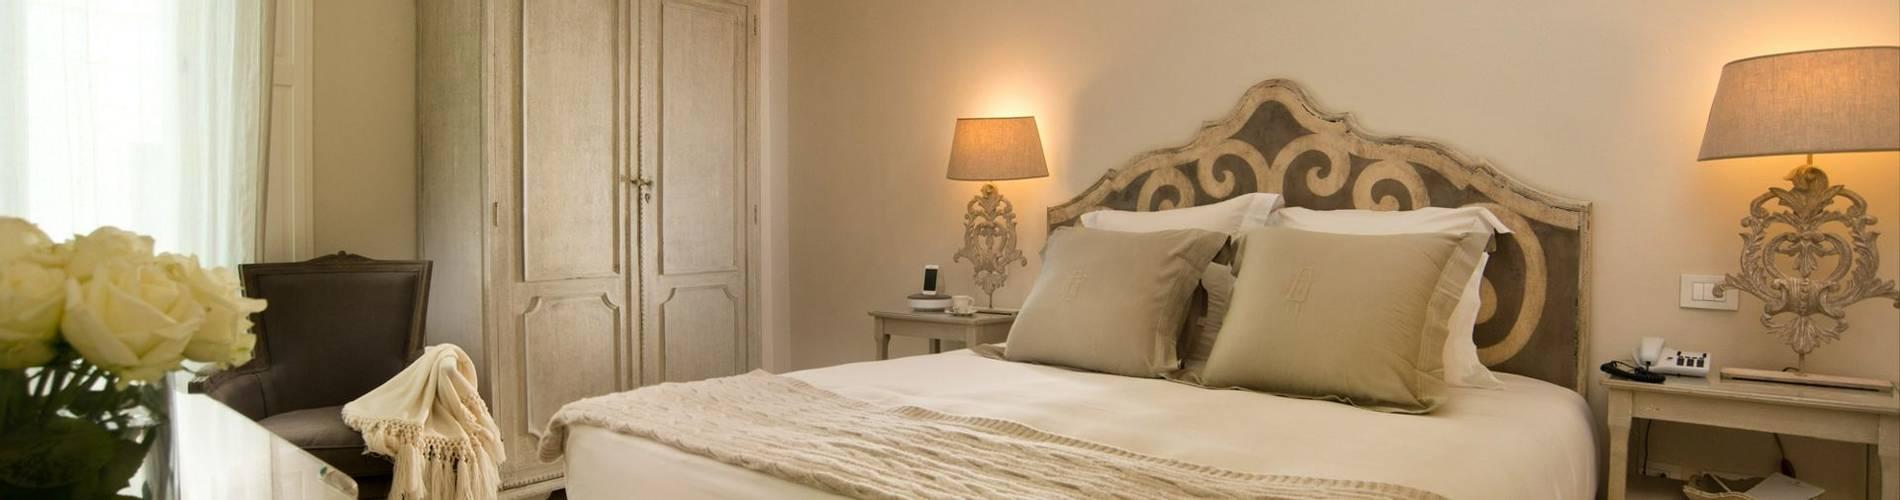 Don Ferrante, Puglia, Italy, Superior Room.jpg